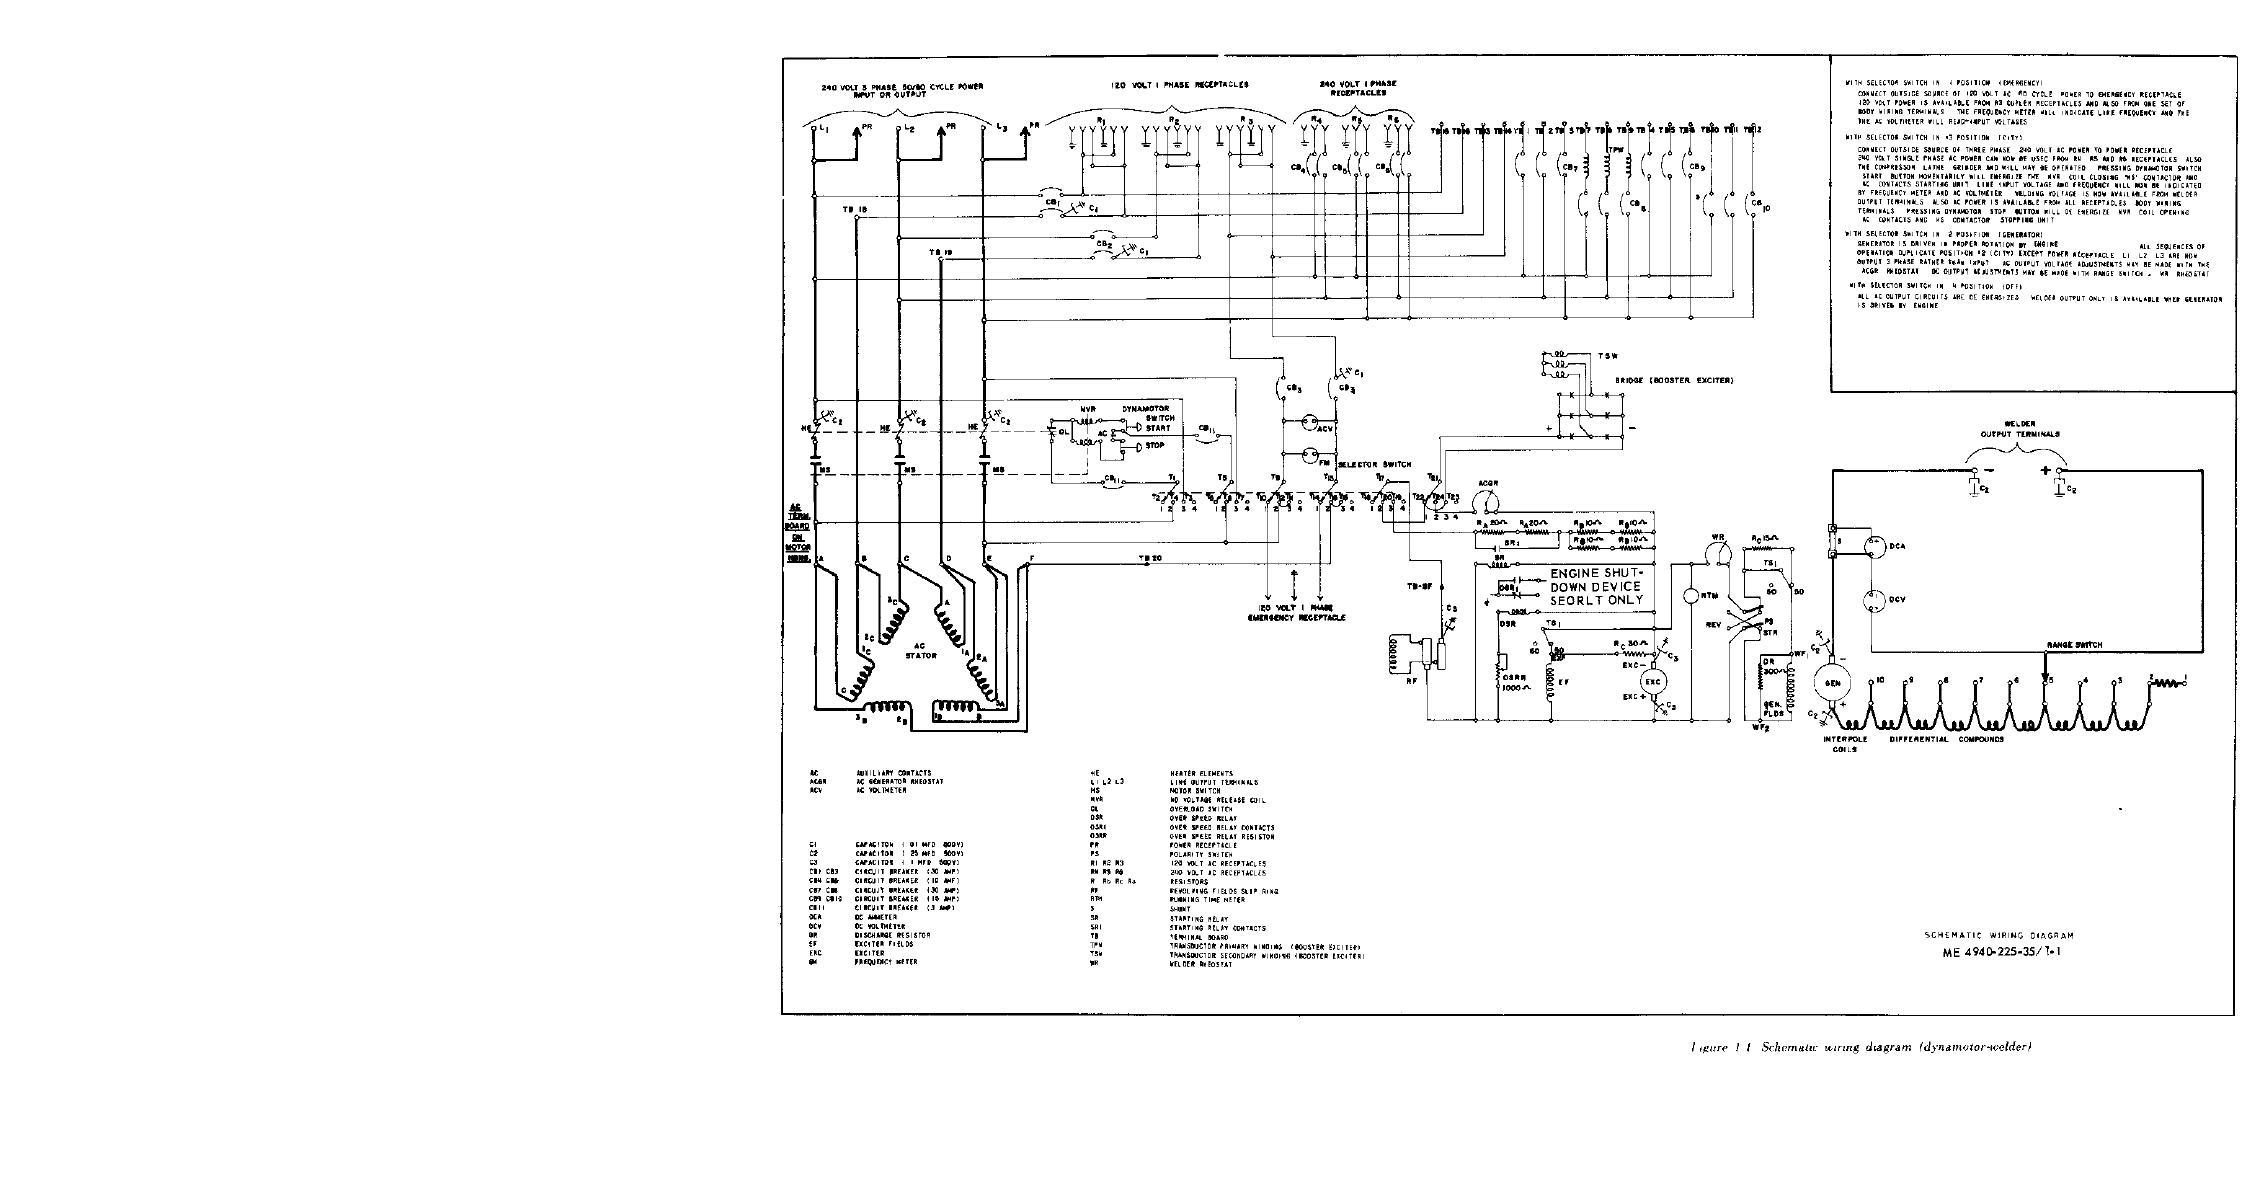 220 Welder Wiring Diagram | Best Wiring Liry on 1978 lincoln continental vacuum diagram, lincoln welder schematic, lincoln welder serial number, mig welder diagram, lincoln welder plug, sullair wiring diagram, ingersoll rand wiring diagram, dynapac wiring diagram, lincoln welder air cleaner, lincoln welder parts list, apache wiring diagram, lincoln welders parts and manuals, lull wiring diagram, arc welder diagram, harley rake wiring diagram, welder equipment diagram, clark wiring diagram, miller 30a spool gun diagram, towmotor wiring diagram, lincoln welder fuel pump,